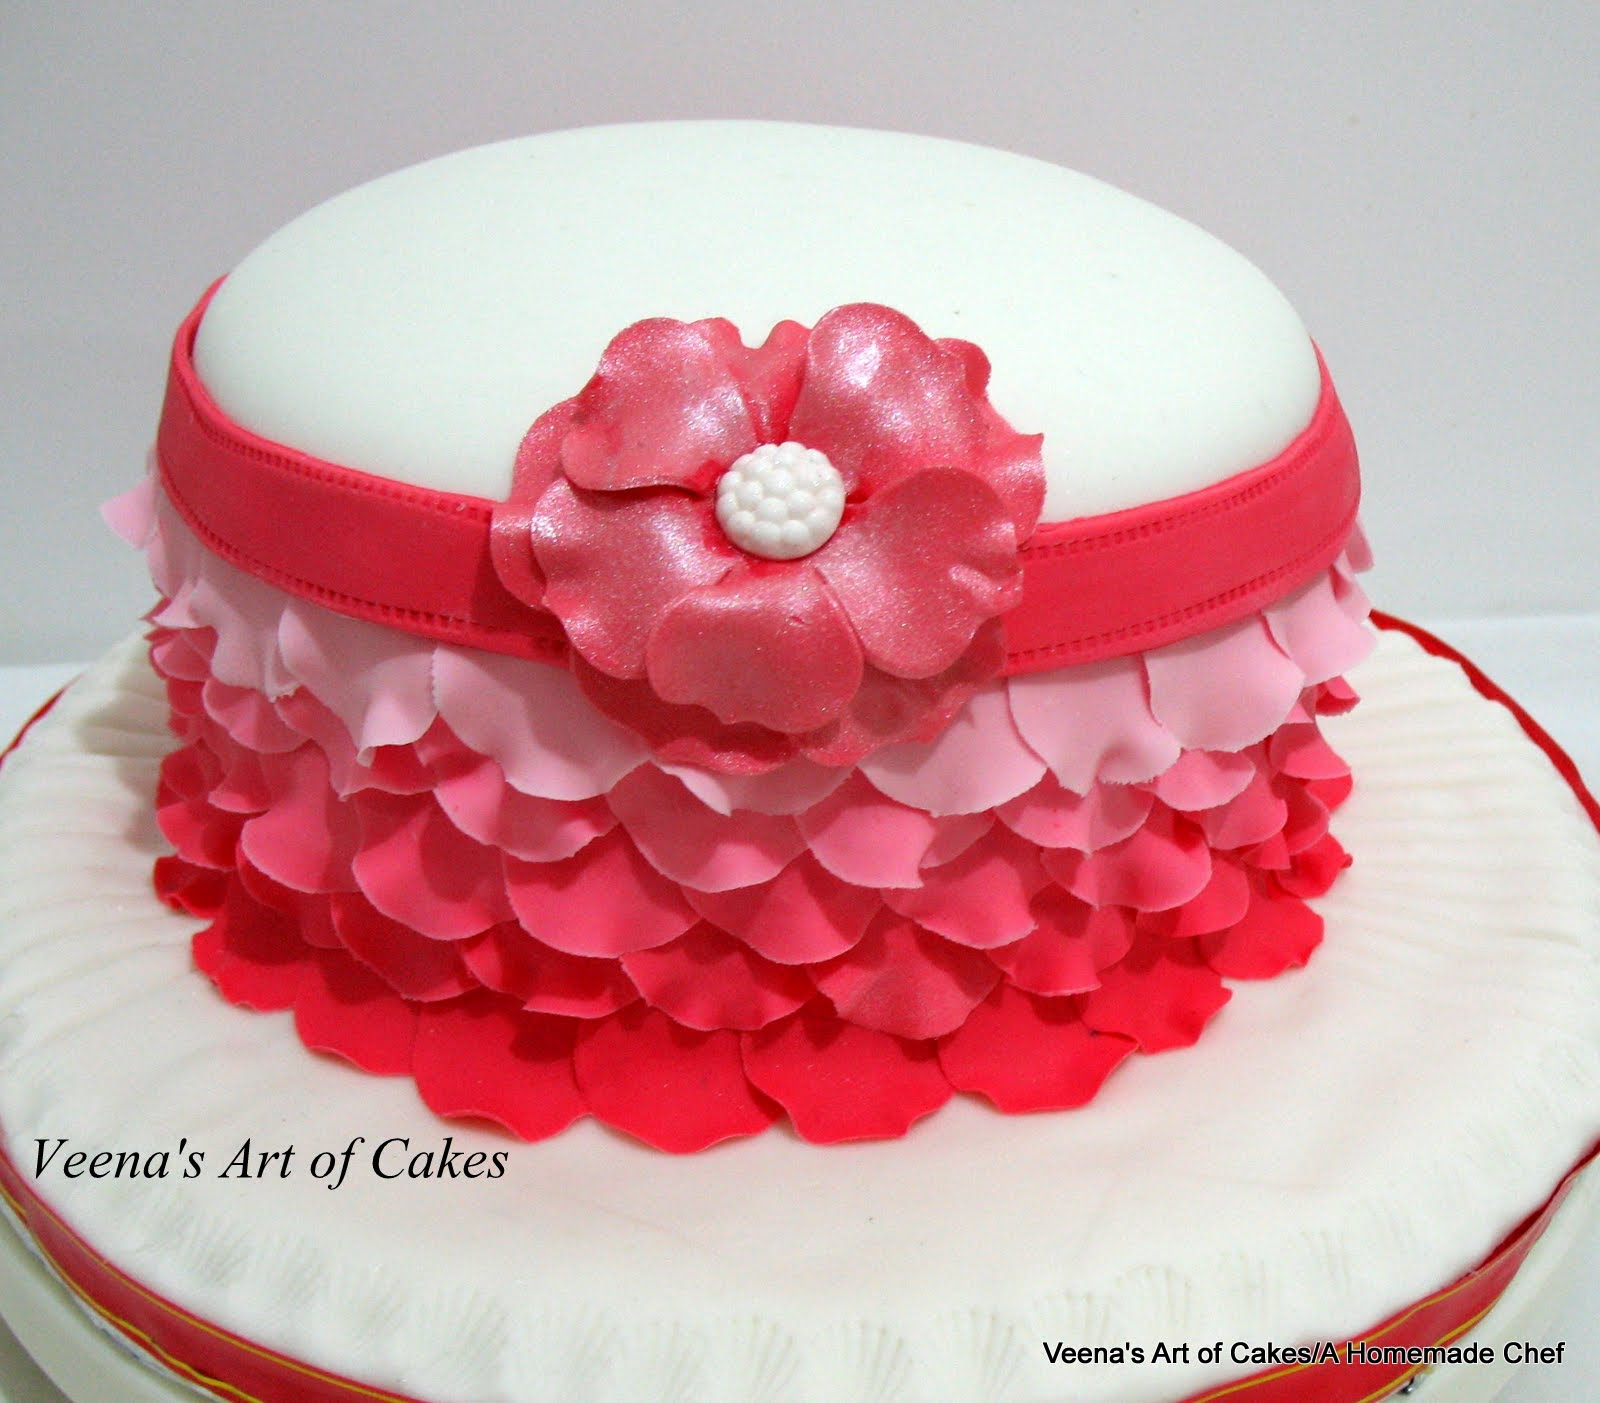 Rose Petal Cake Images : Ombre Rose Petal Cake Video Tutorial